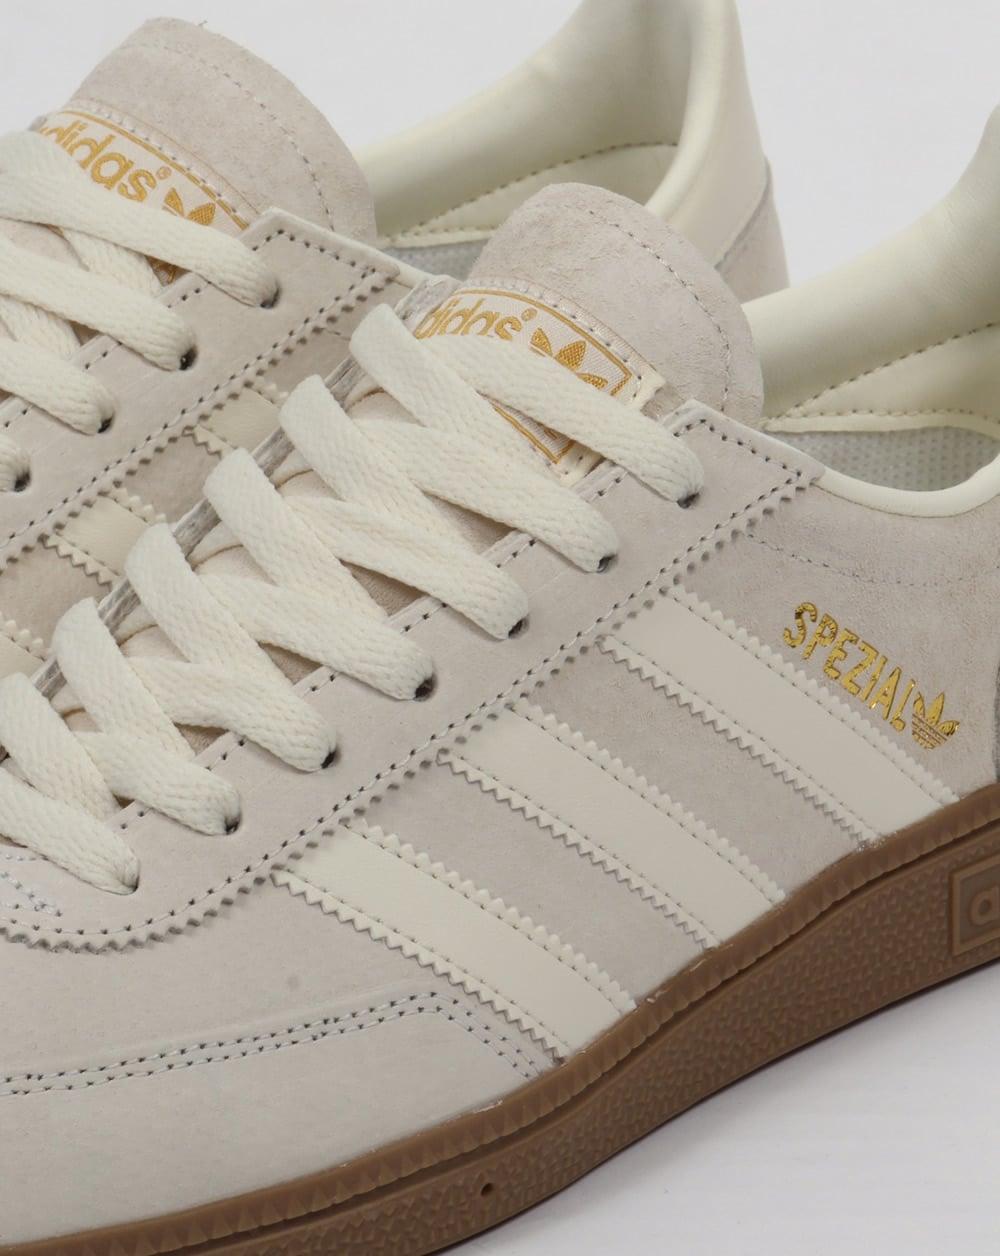 Adidas spezial formatori bianco / bianco, camoscio, Uomo